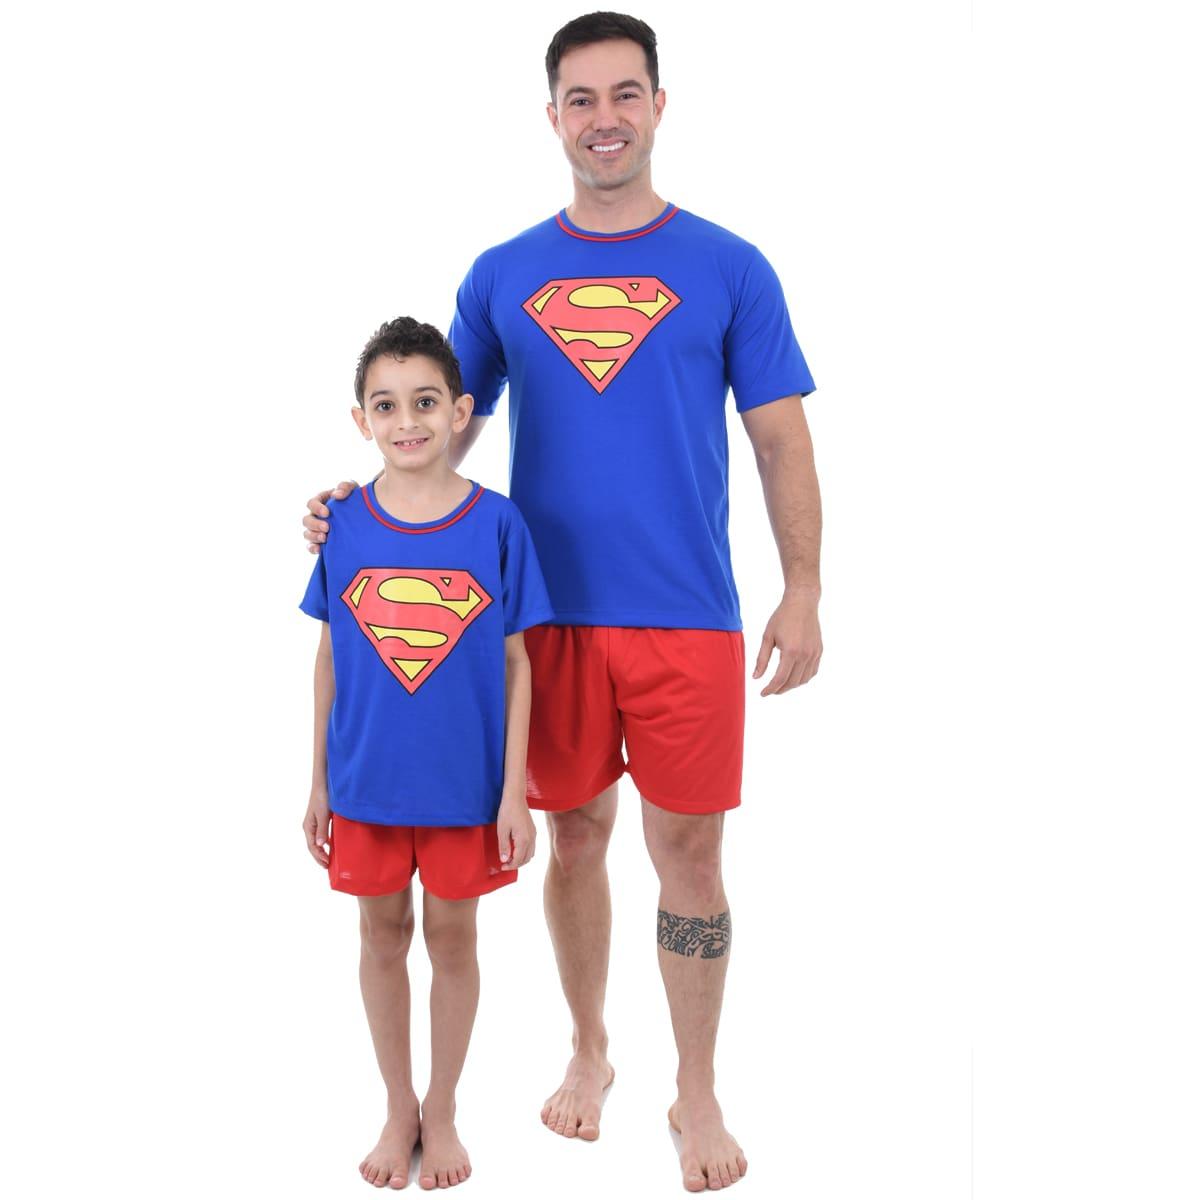 Pijama Meia Manga Short Masculino Infantil Menino Superman Super Homem Ref 348